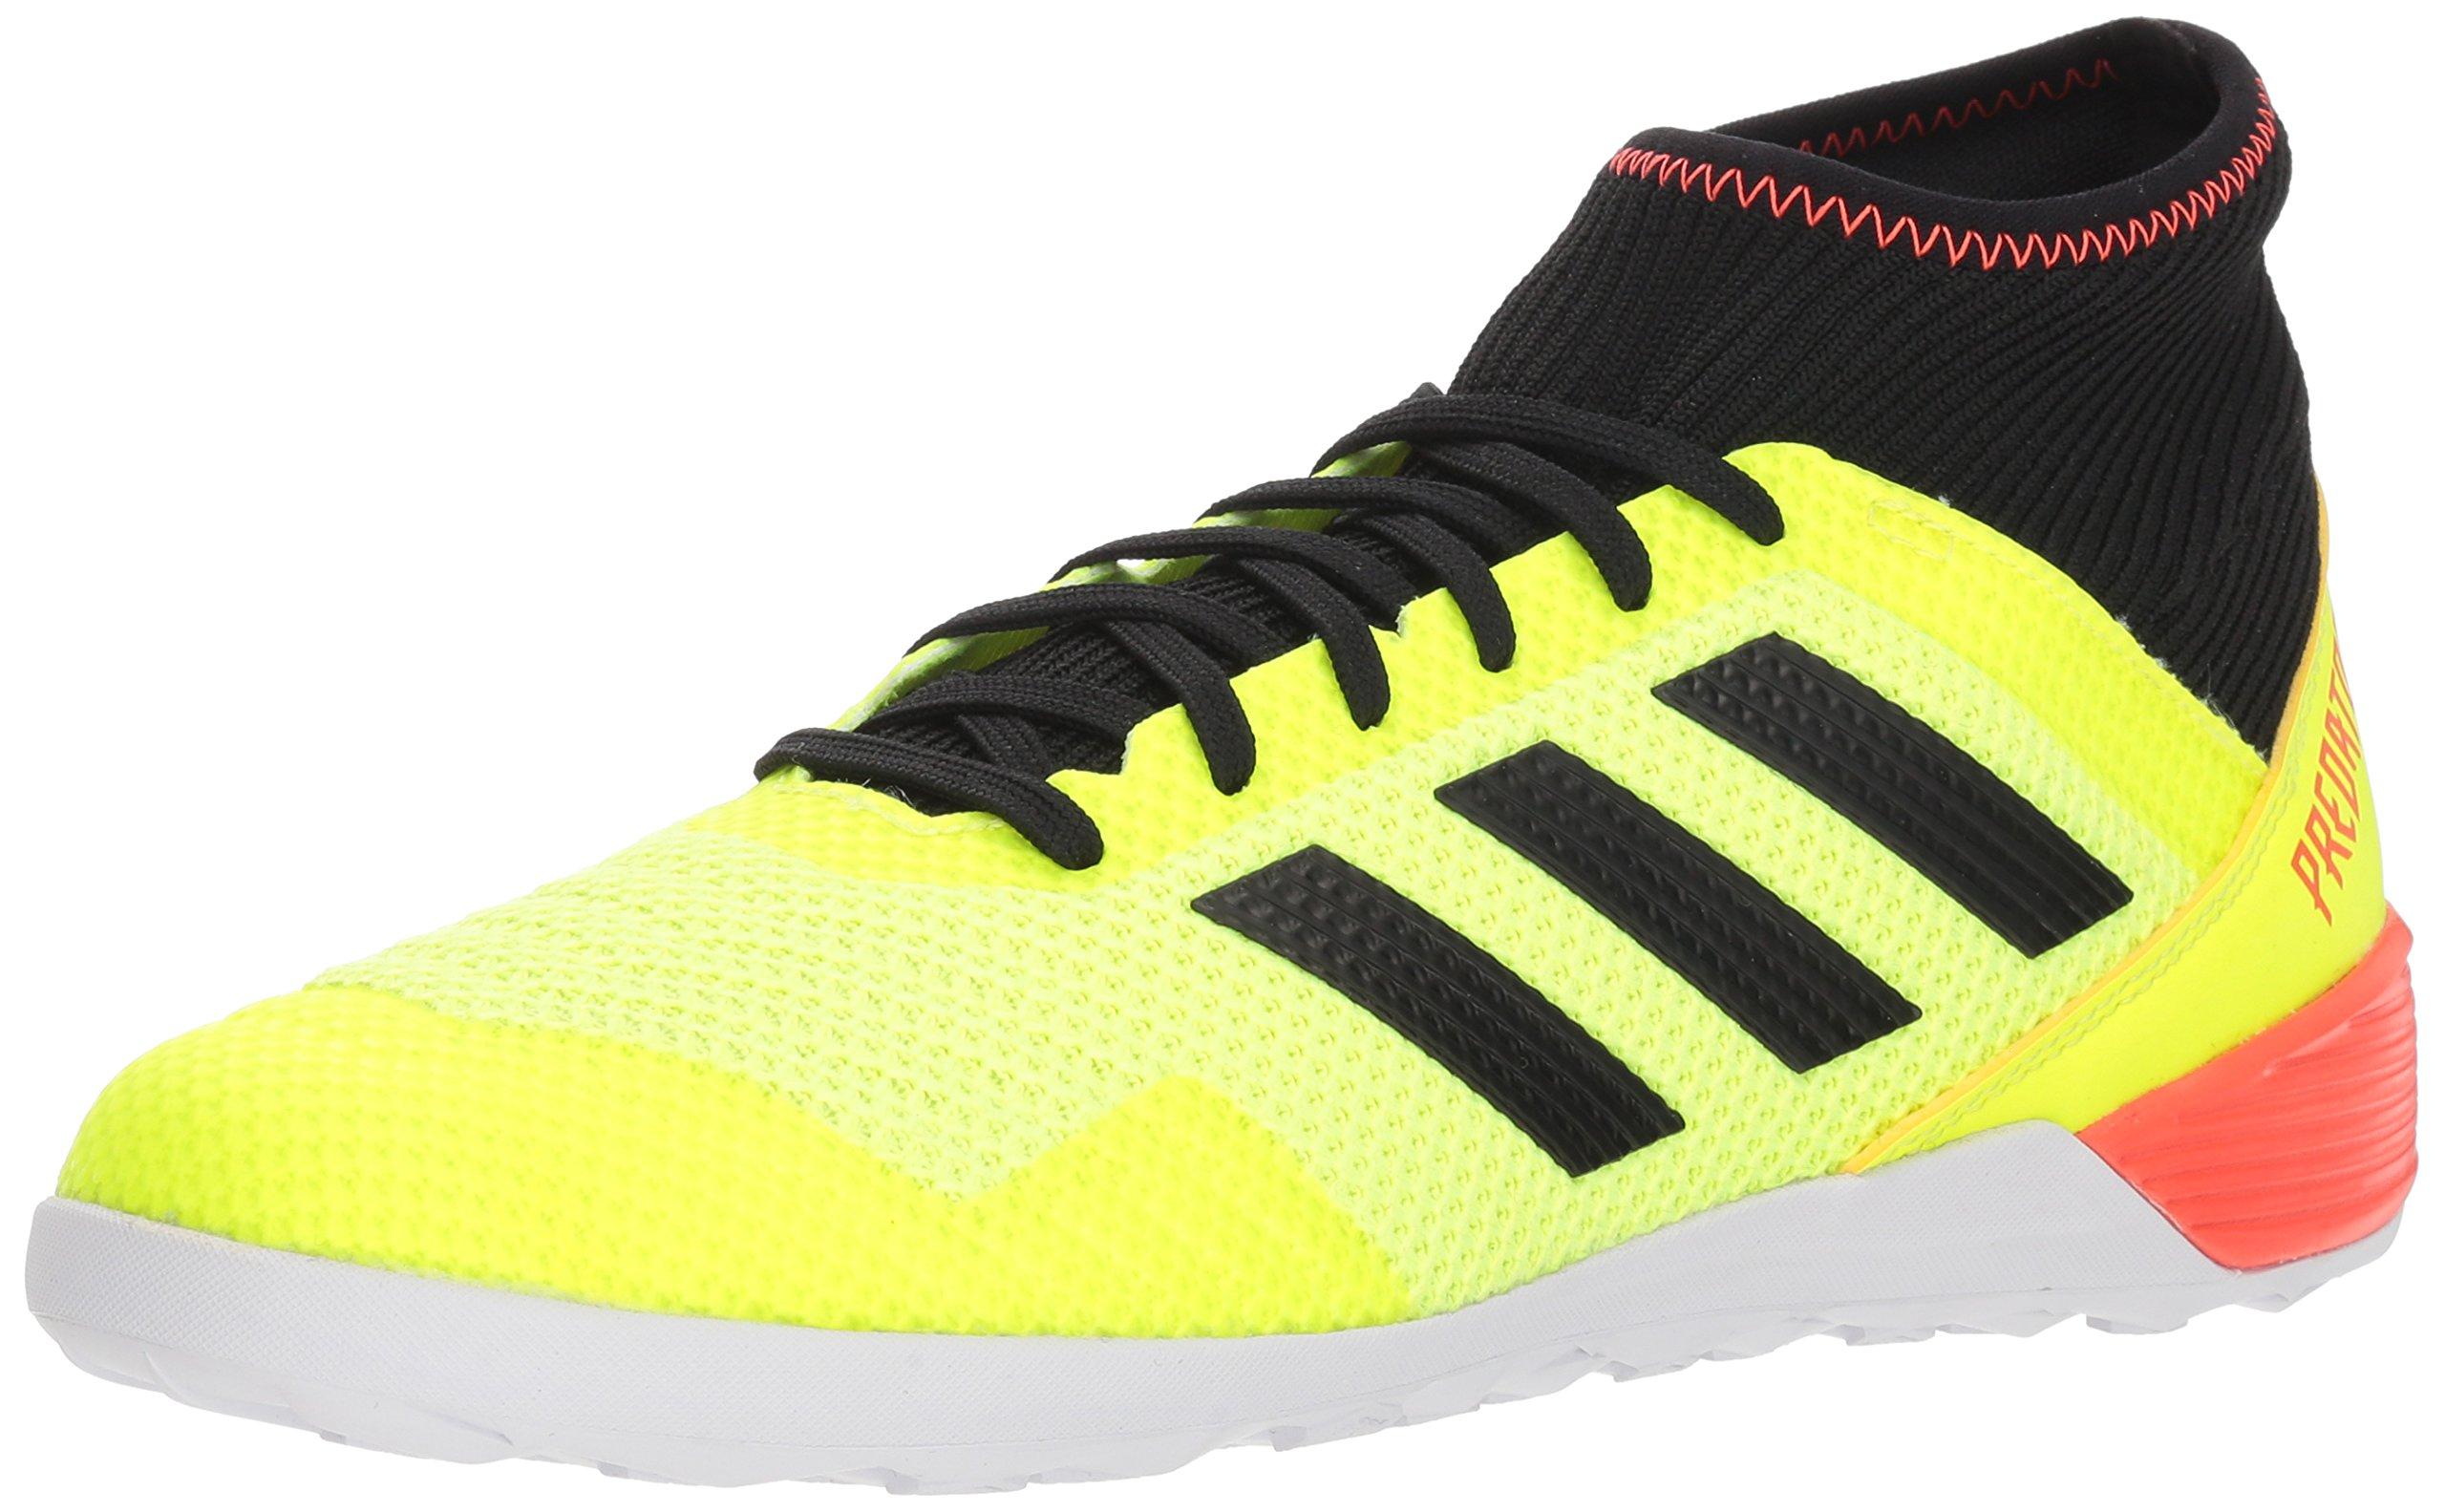 adidas Men's Predator Tango 18.3 Indoor Soccer Shoe, Solar Yellow/Black/Solar Red, 6.5 M US